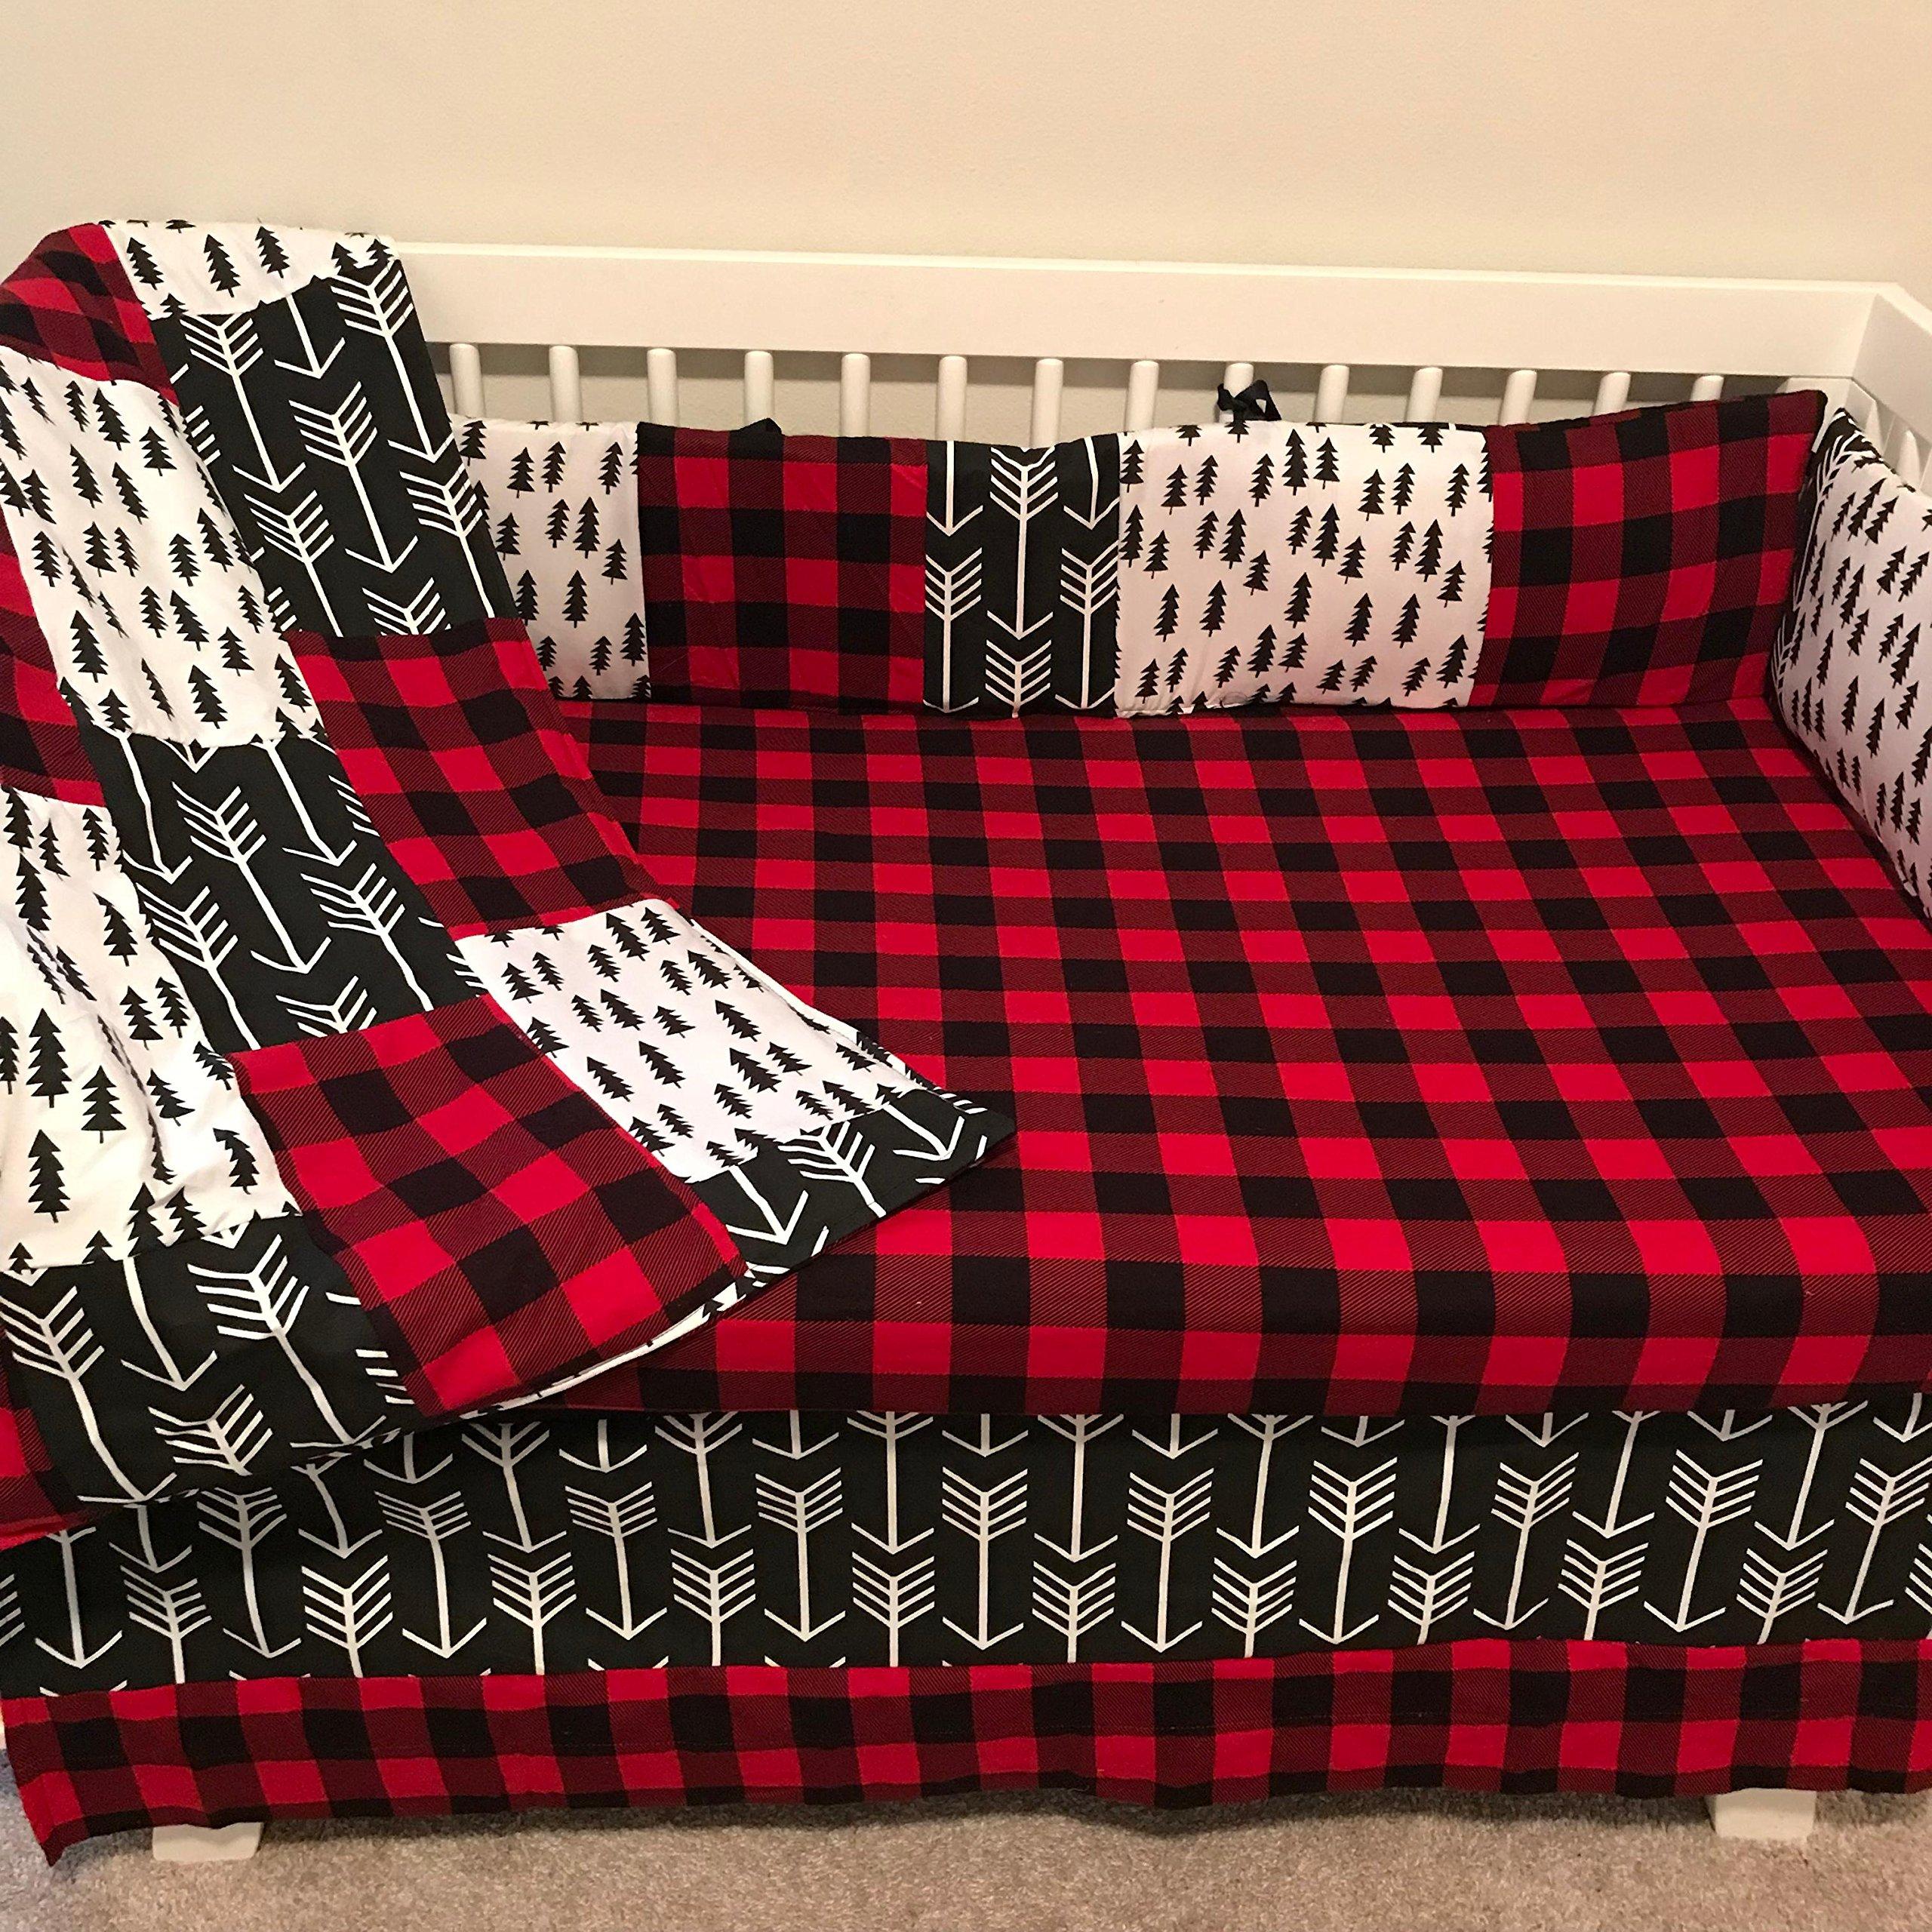 AllTot Crib Bedding Set-Woodland Red- 4 Piece crib bedding set